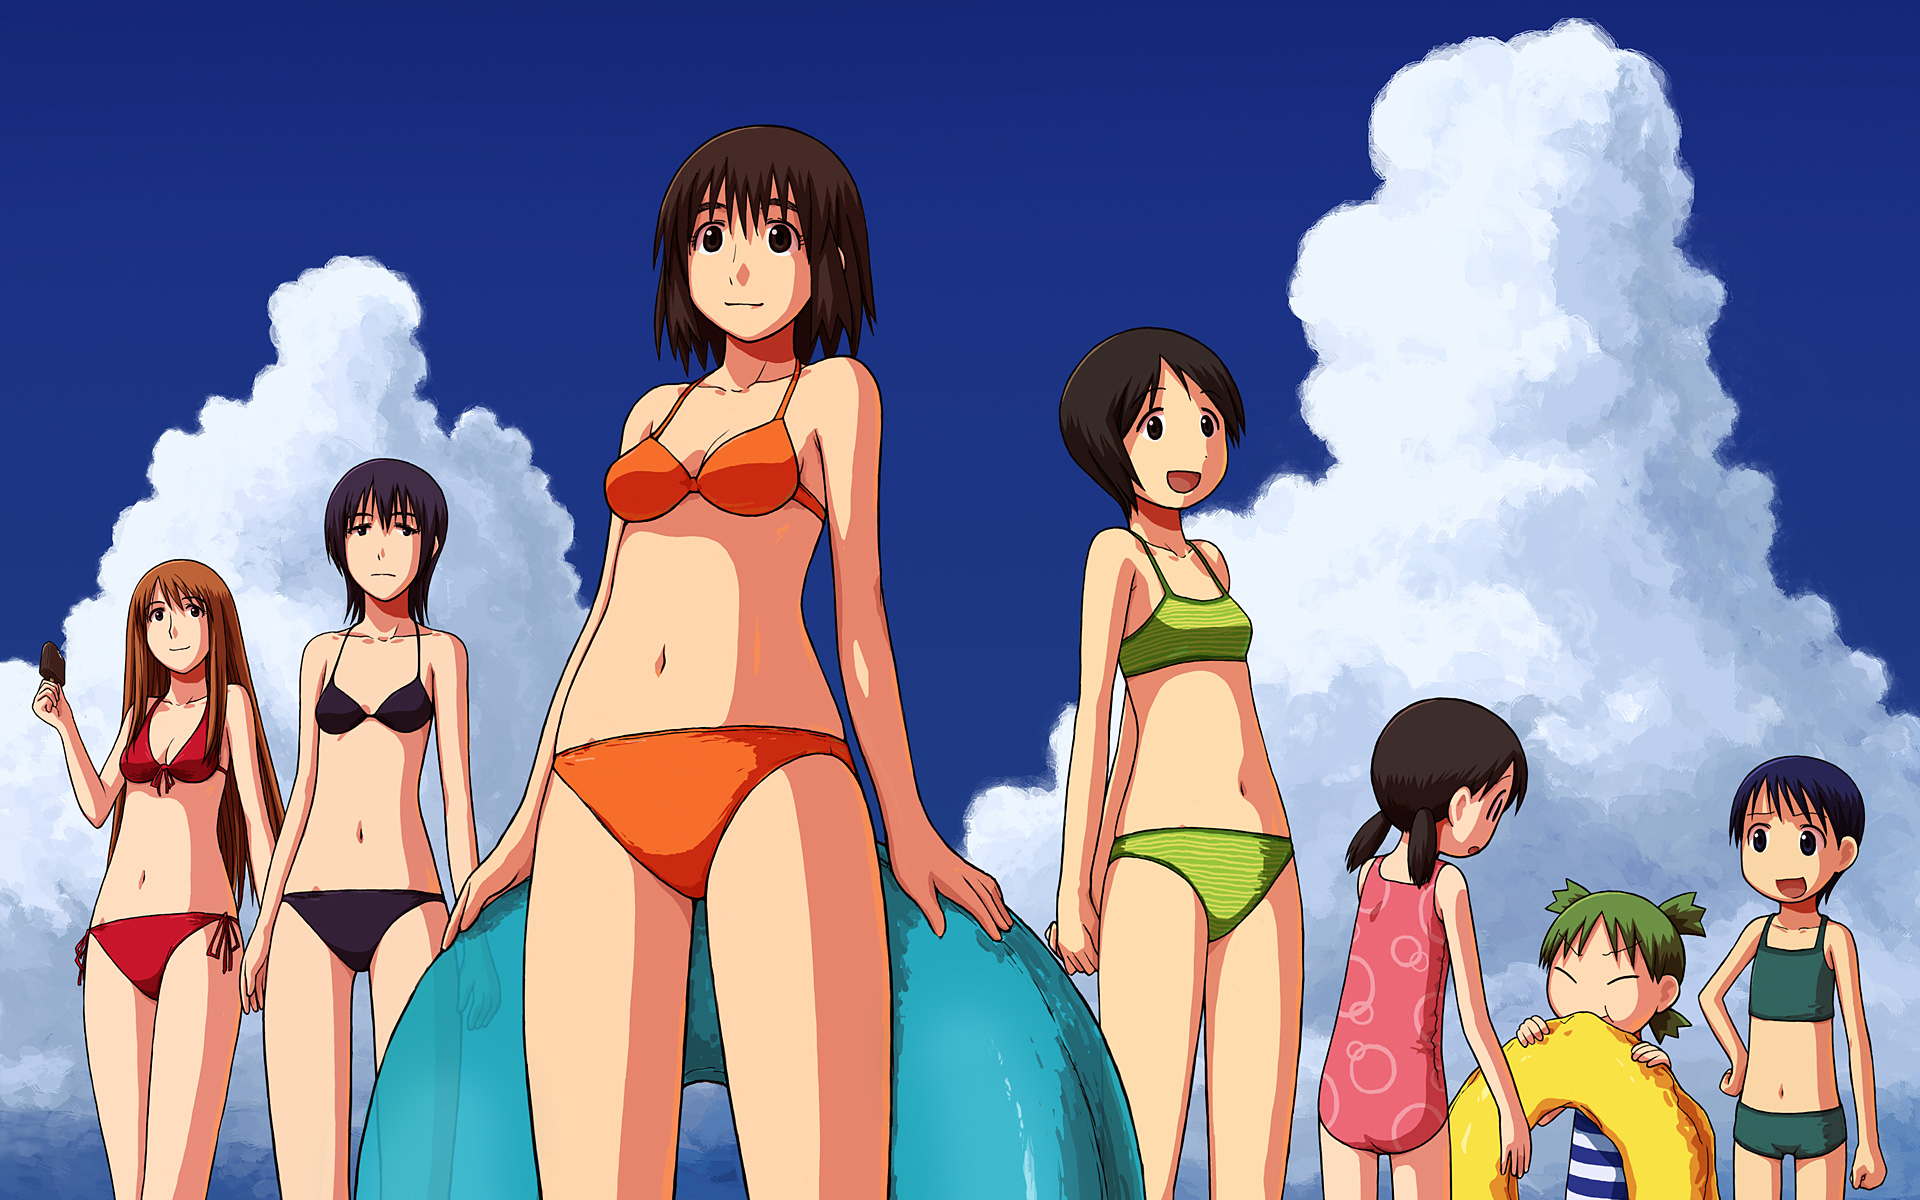 ayase_asagi ayase_ena ayase_fuuka bikini group hiwatari koiwai_yotsuba miura_hayasaka swimsuit torako yotsubato!